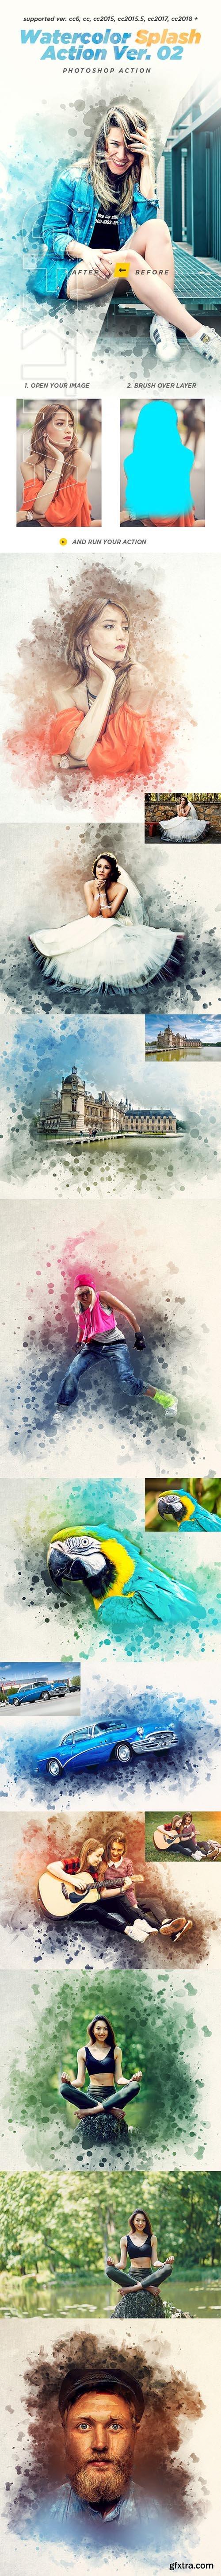 GraphicRiver - Watercolor Splash Photoshop Action Ver. 02 21461987